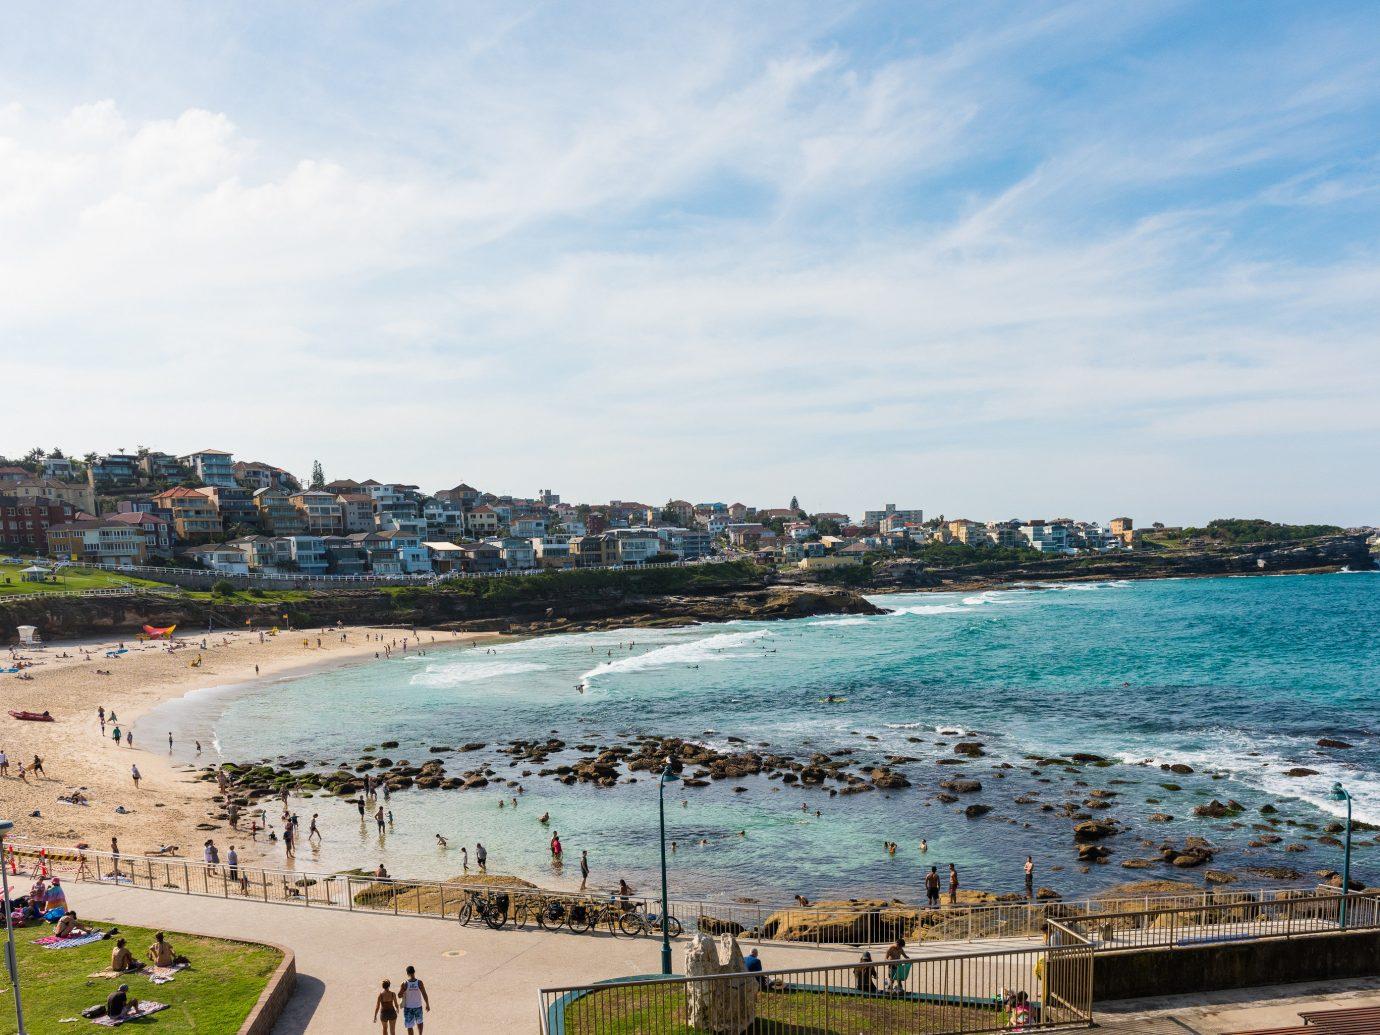 Coogee beach in Australia